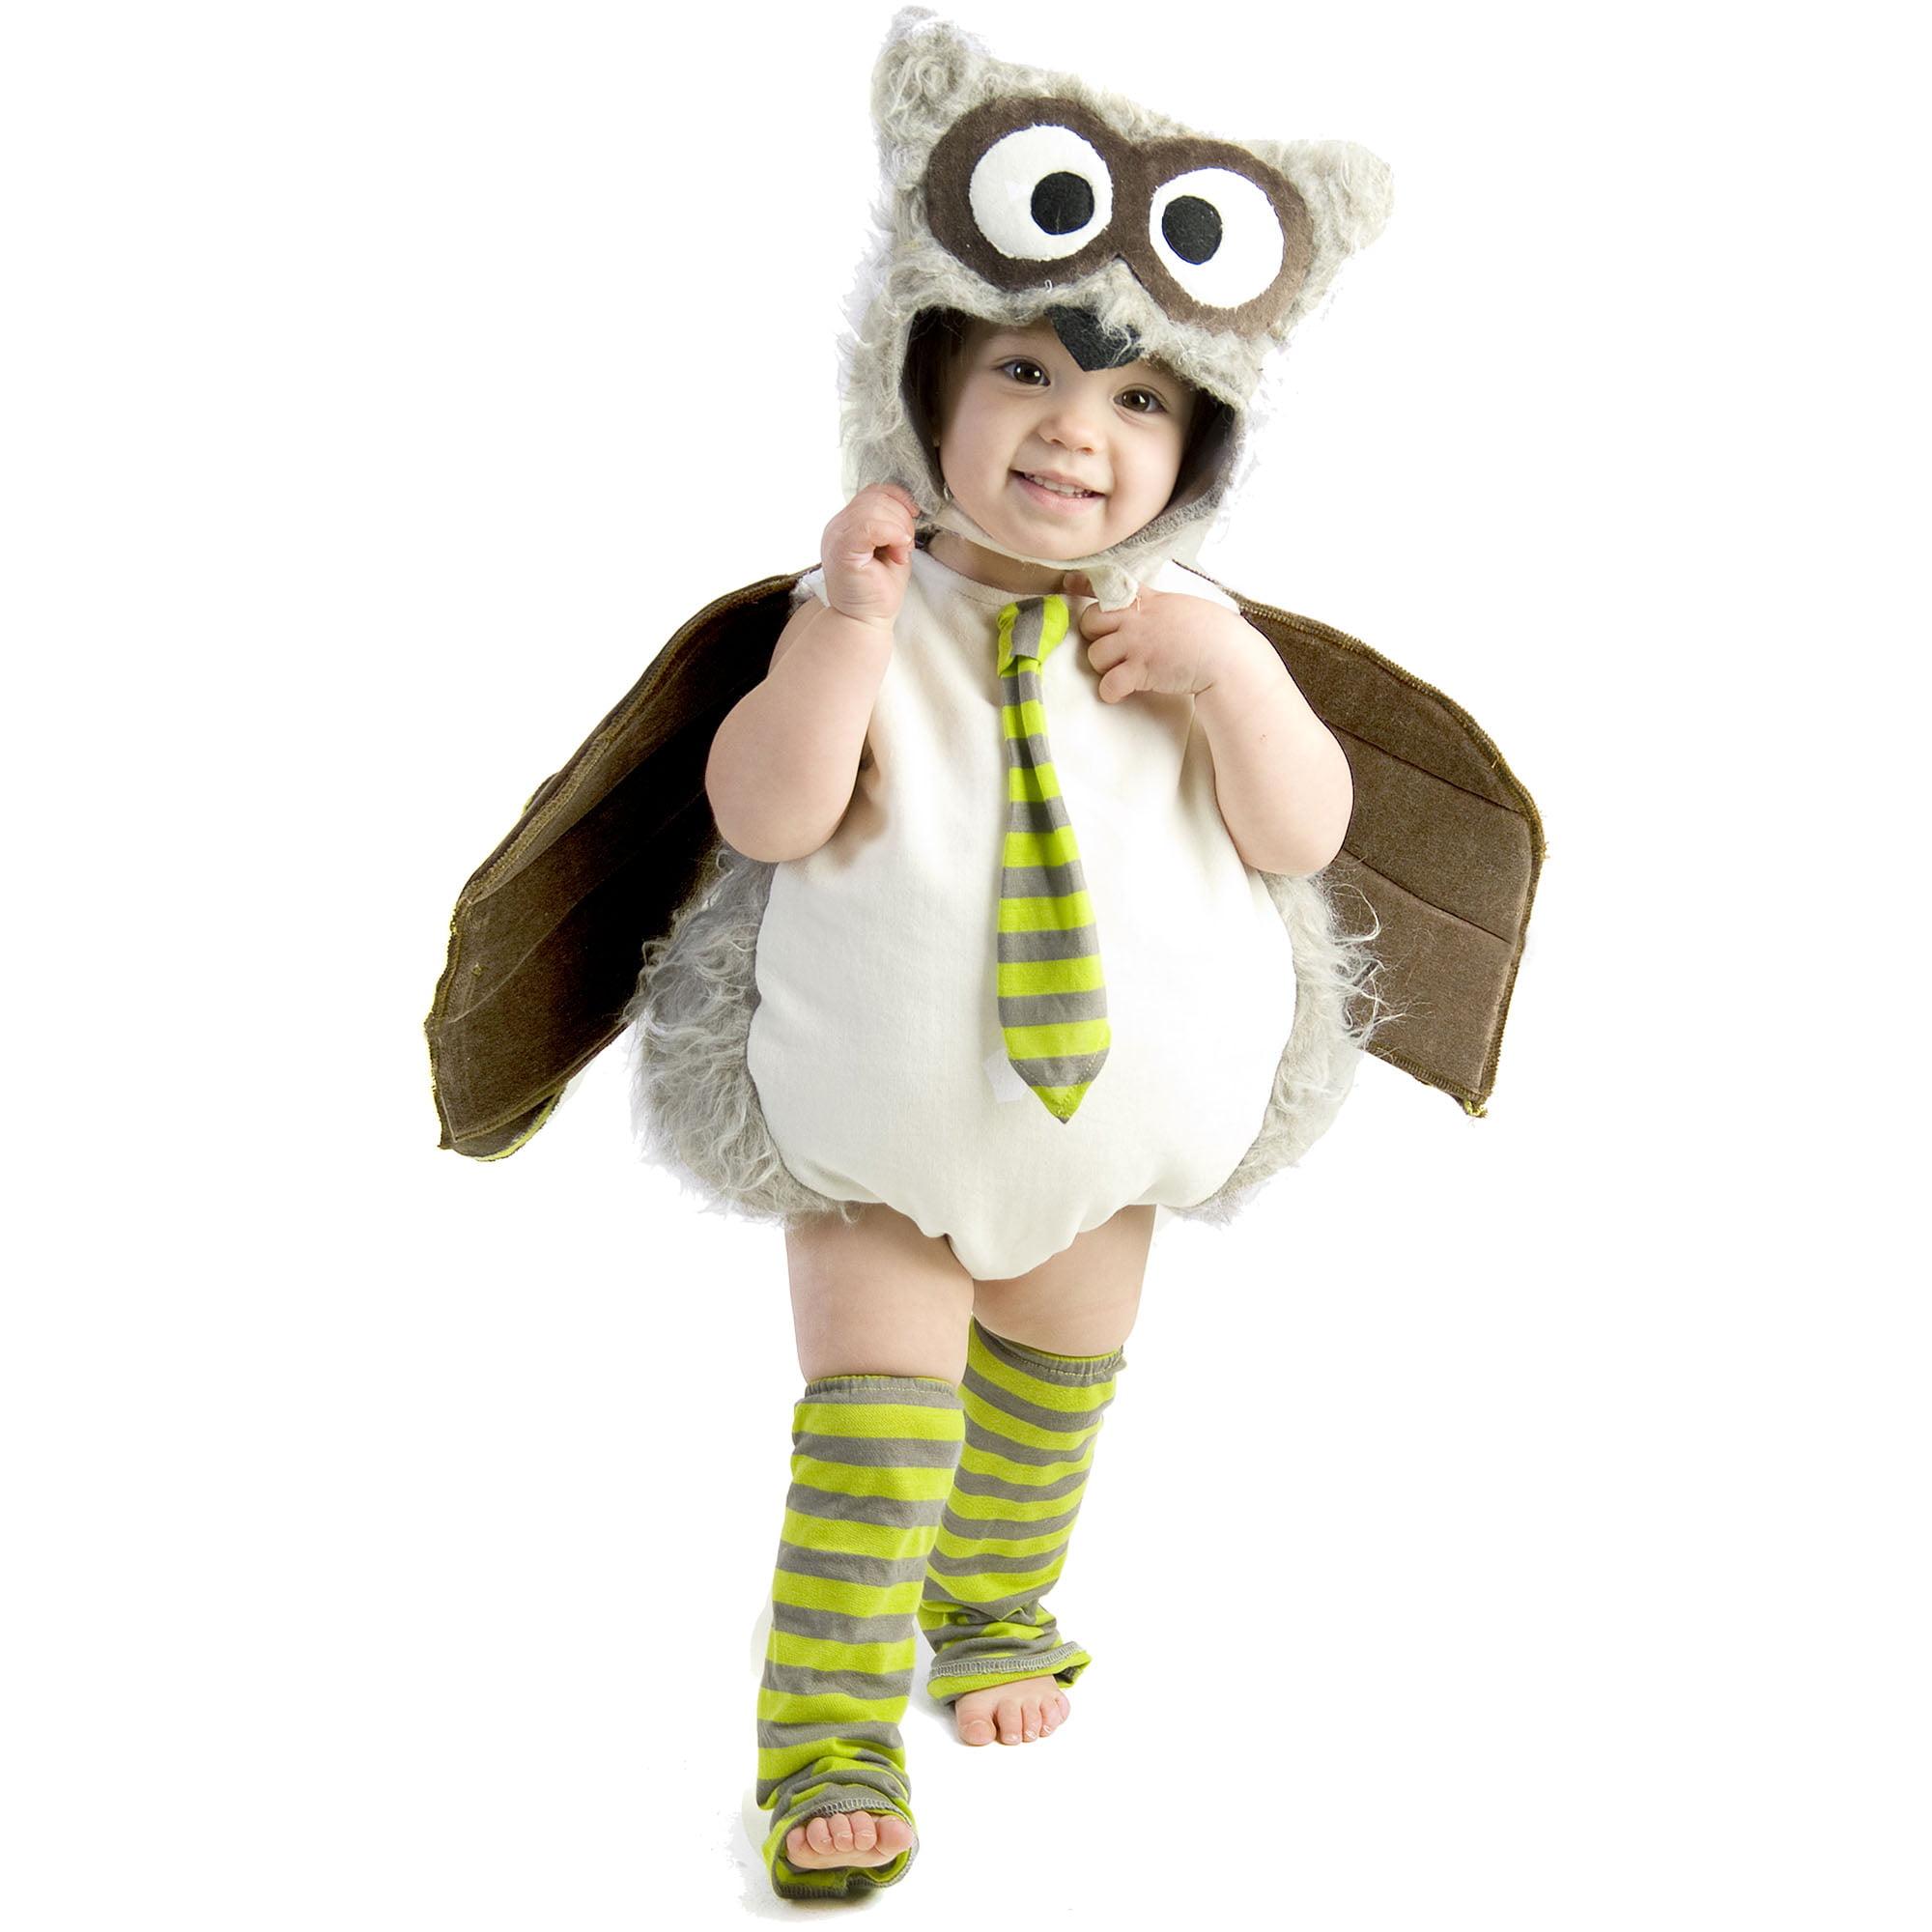 Princess Paradise Premium Edward the Owl Child Costume